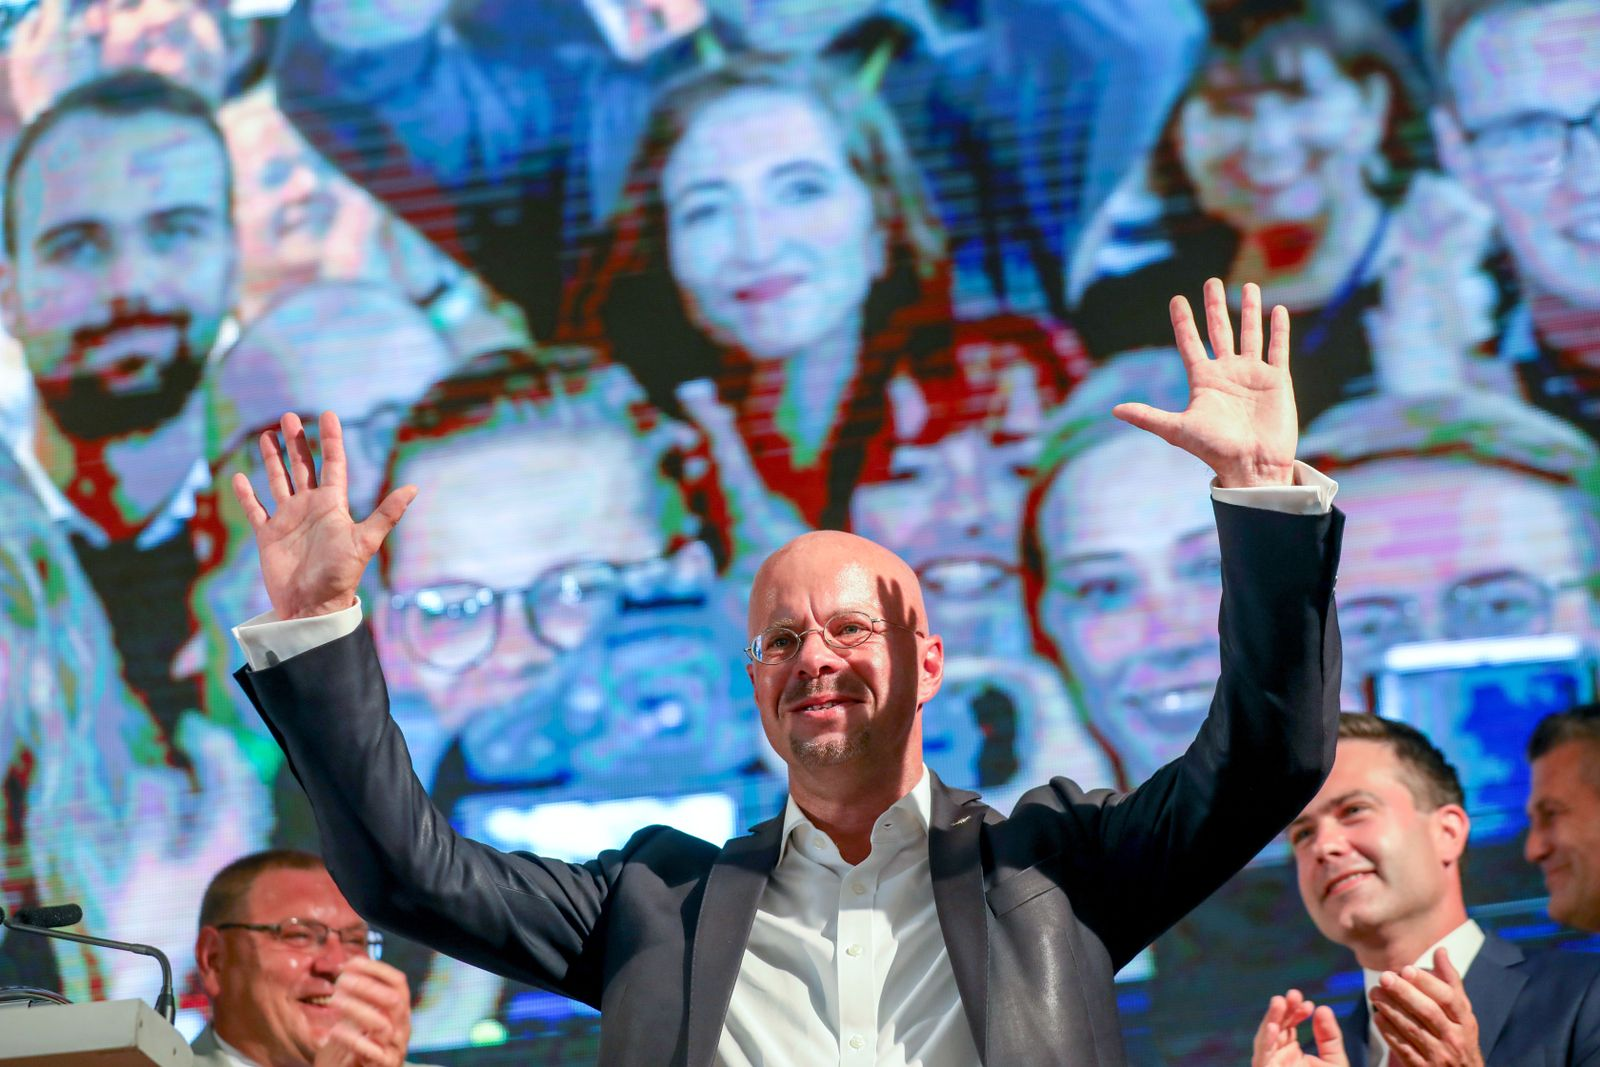 Regional elections in Brandenburg 2019, Werder, Germany - 01 Sep 2019